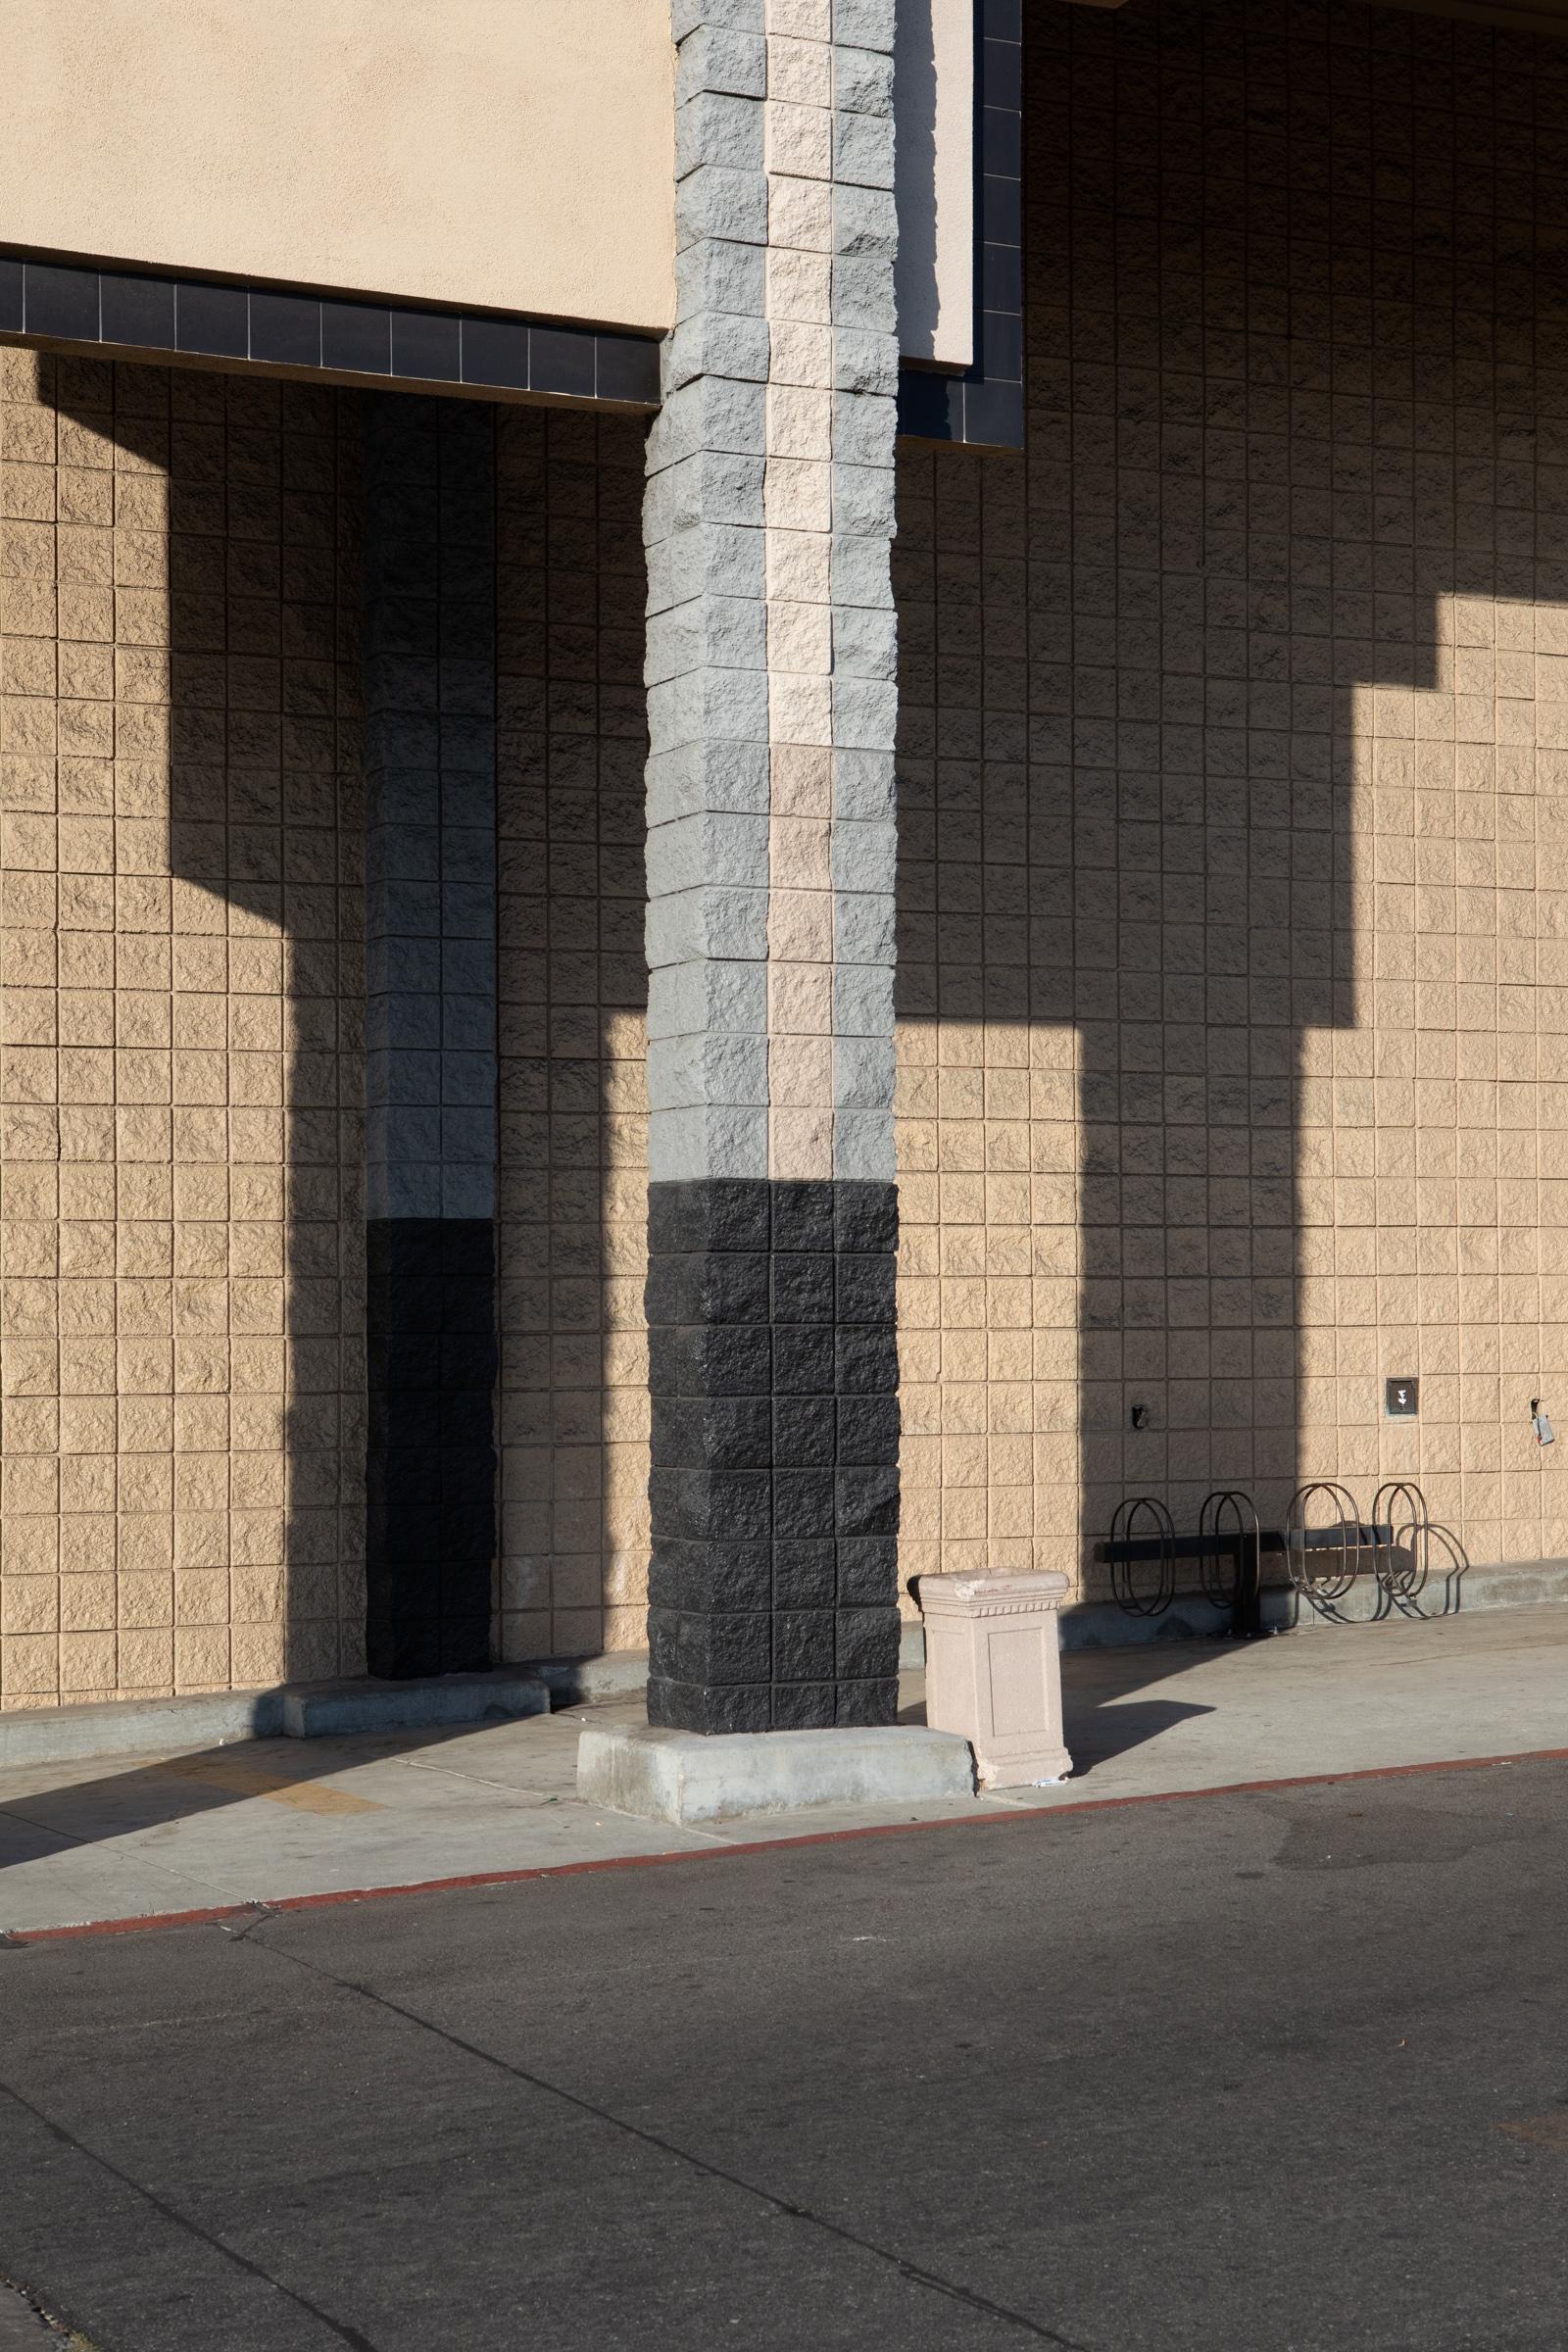 Columns, Postmodern Supermarket - odouglas | ello